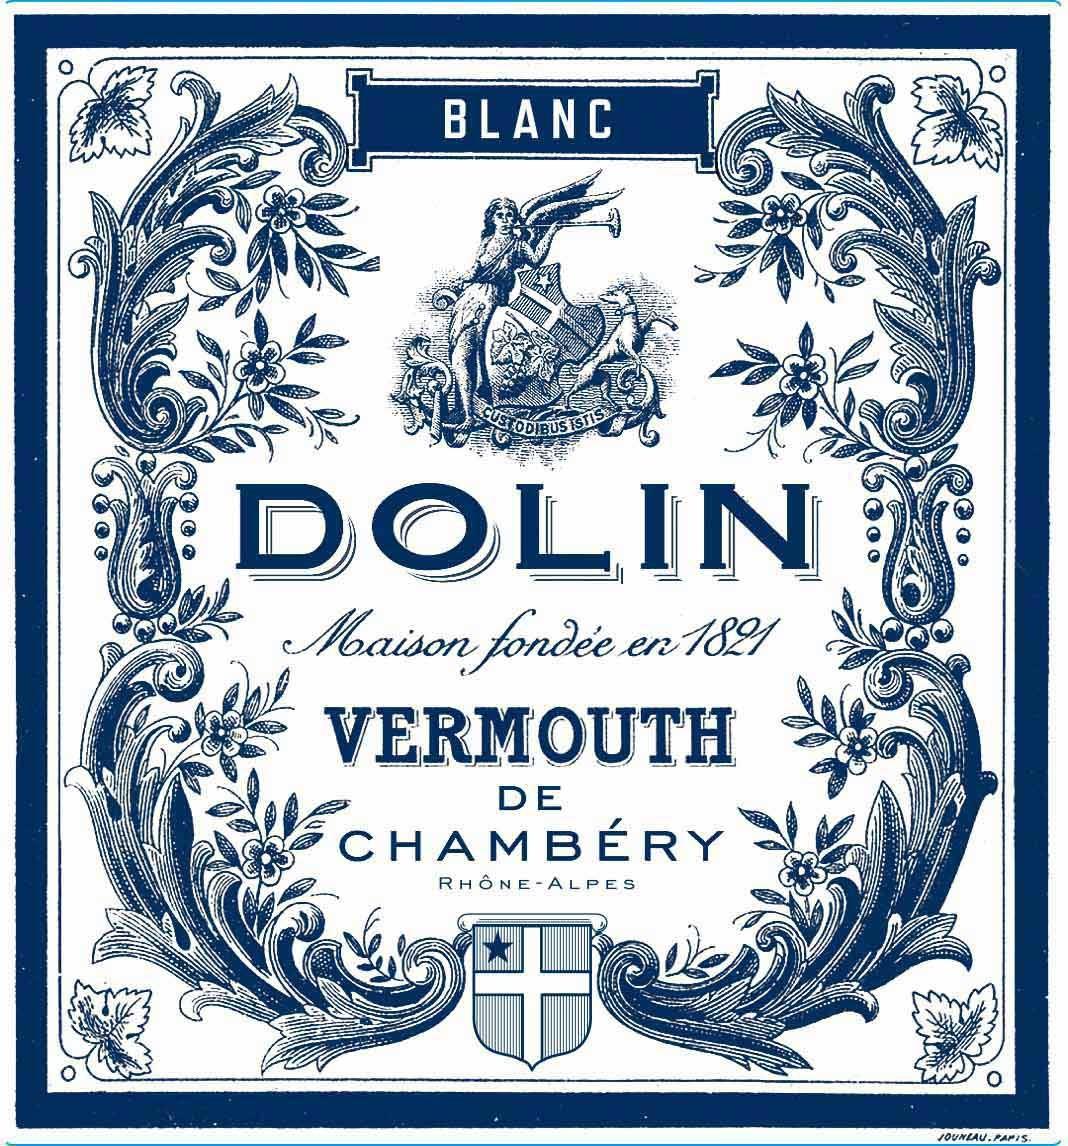 France Dolin Vermouth de Chambery Blanc 750mL